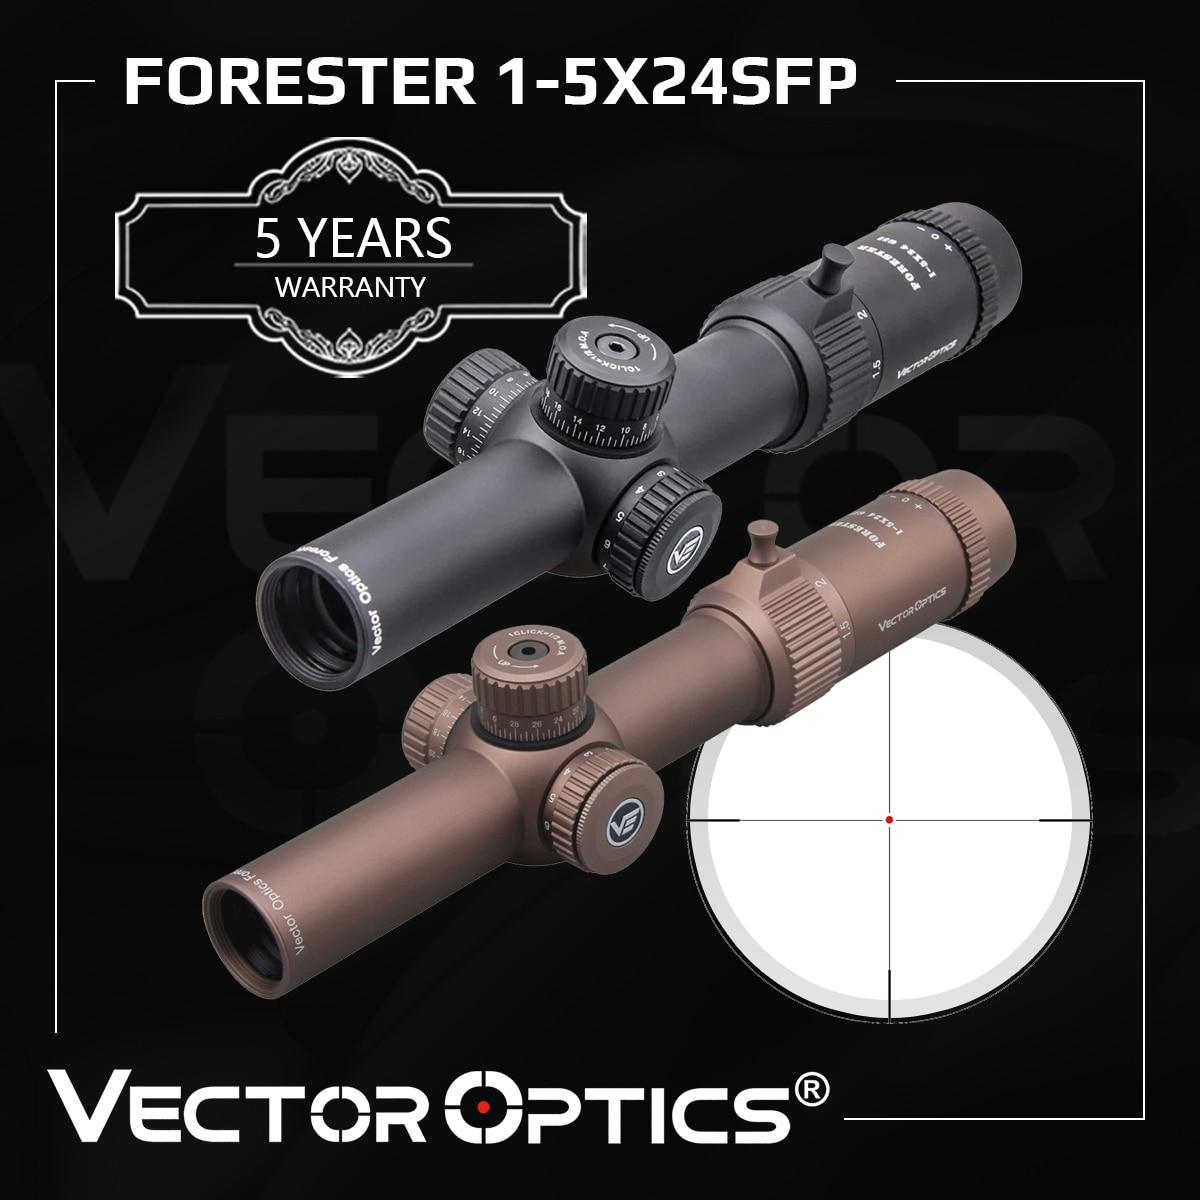 ناقلات البصريات GenII فورستر 1-5x24 Riflescope 30 مللي متر مركز نقطة مضيئة يناسب AR15 .223 7.62 مللي متر Airgun Airsoft نطاق الصيد